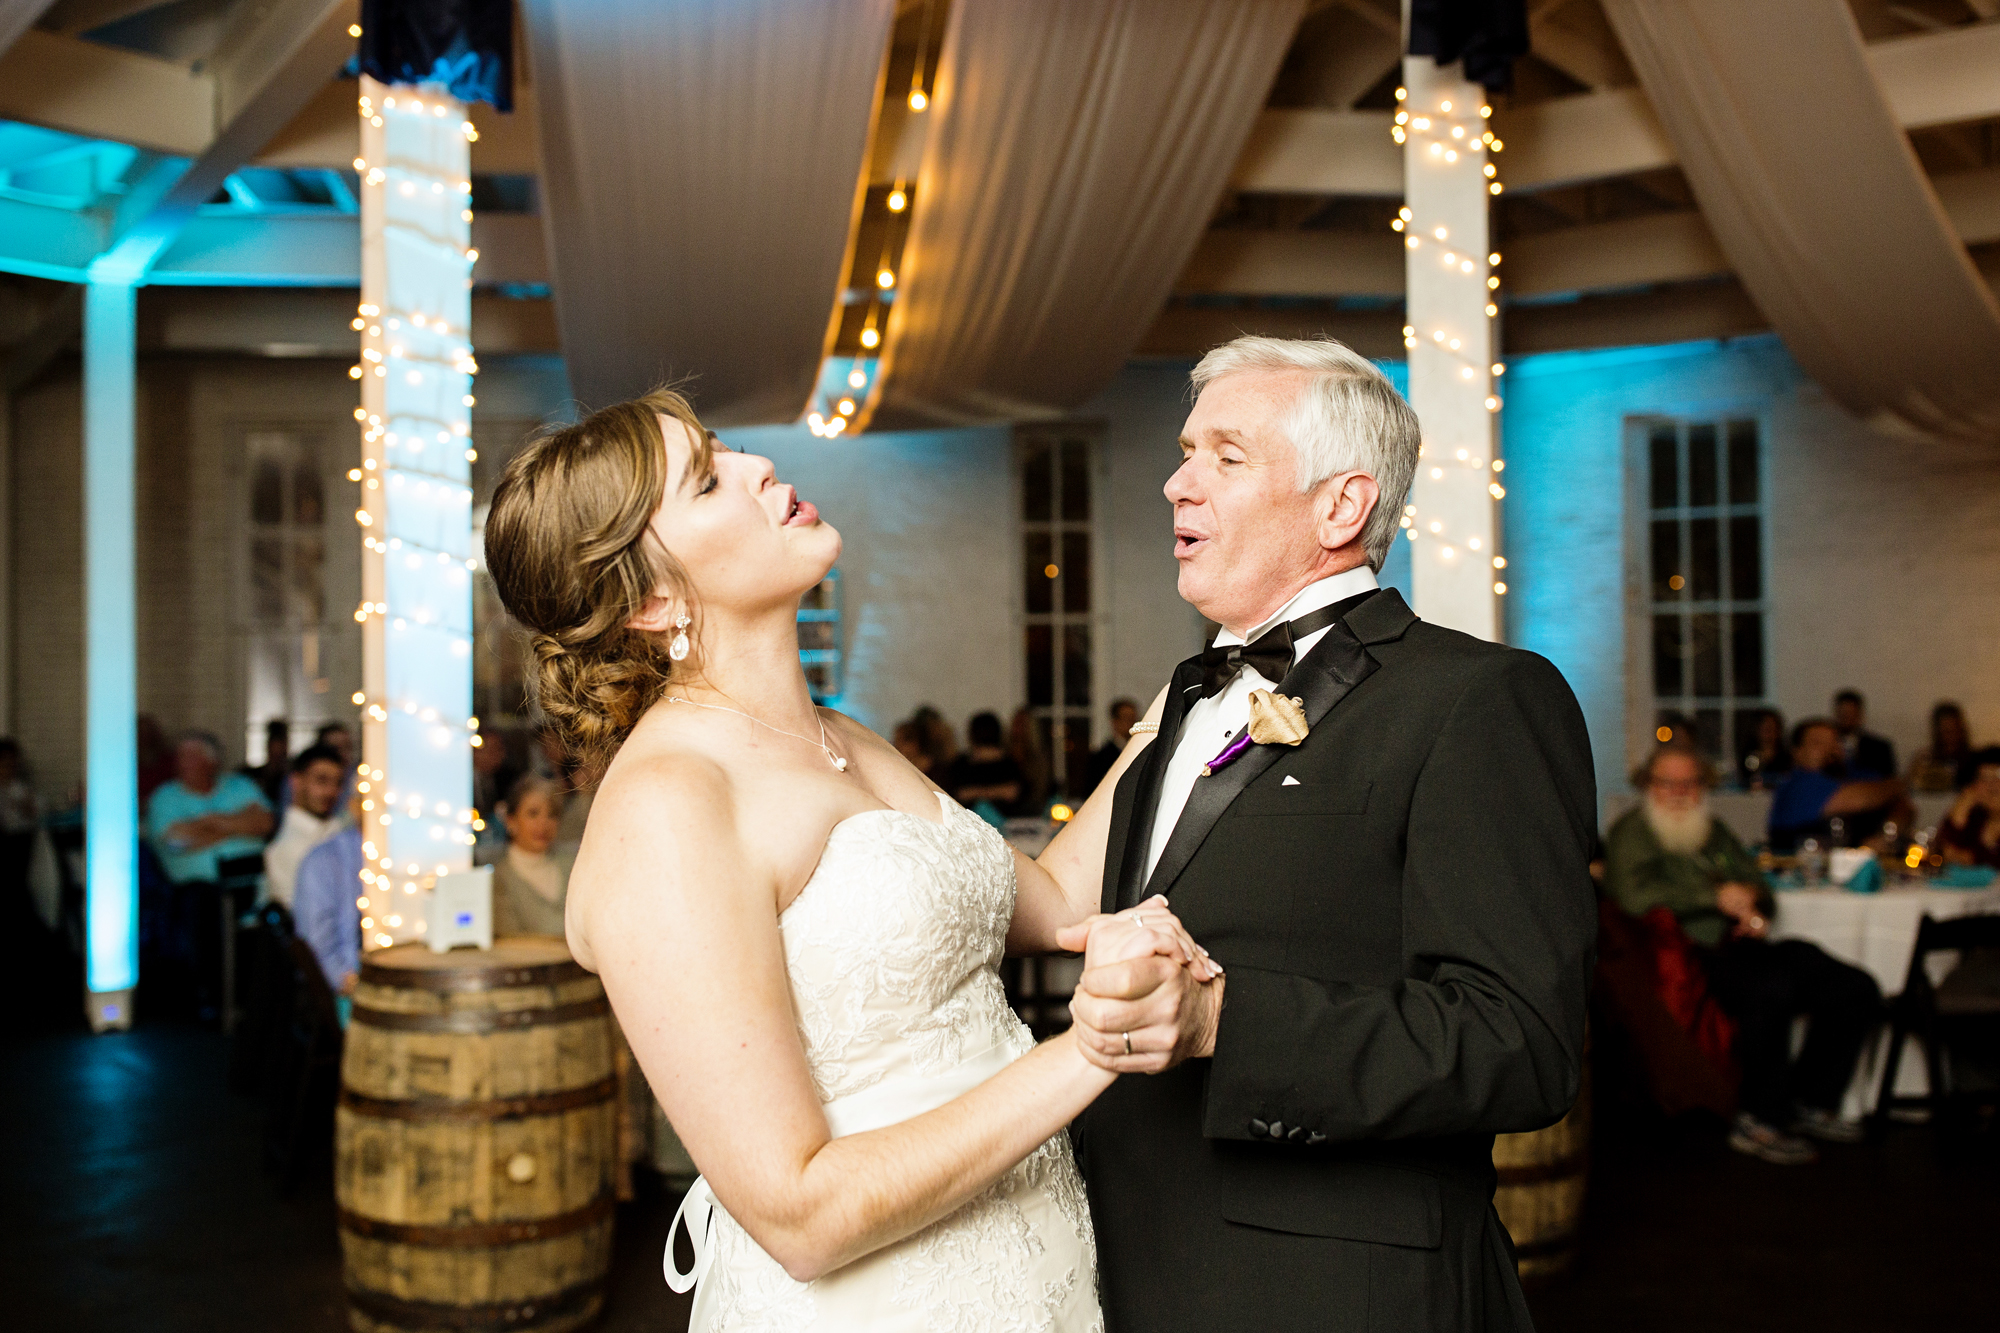 Seriously_Sabrina_Photography_Lexington_Kentucky_21c_Round_Barn_Red_Mile_Wedding_Gorley_117.jpg